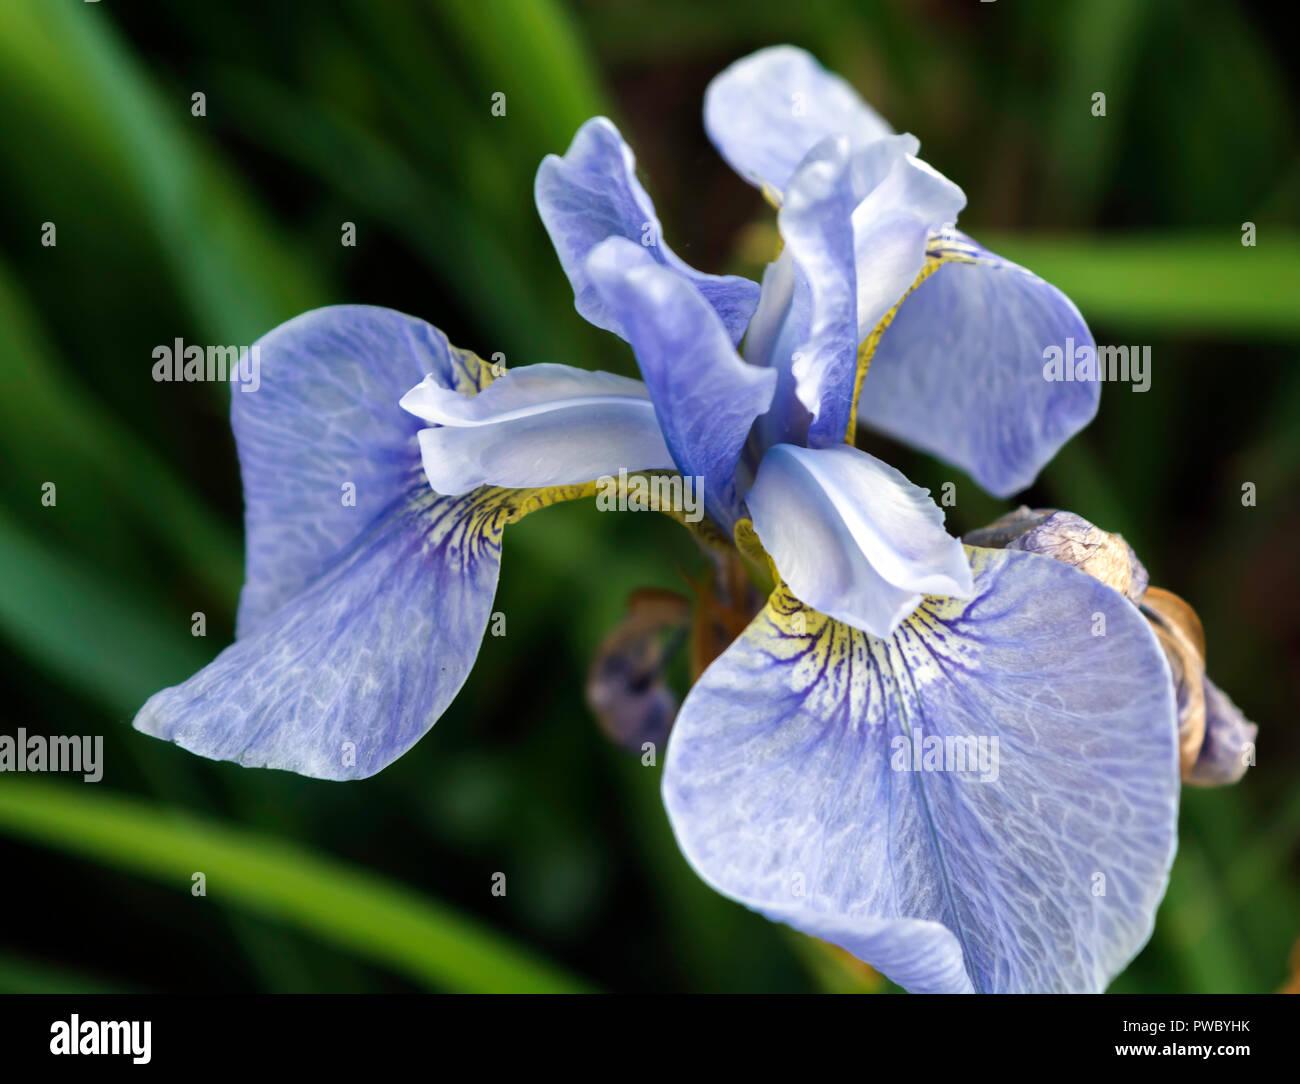 Blue Irises Iris Flower Stock Photos Blue Irises Iris Flower Stock